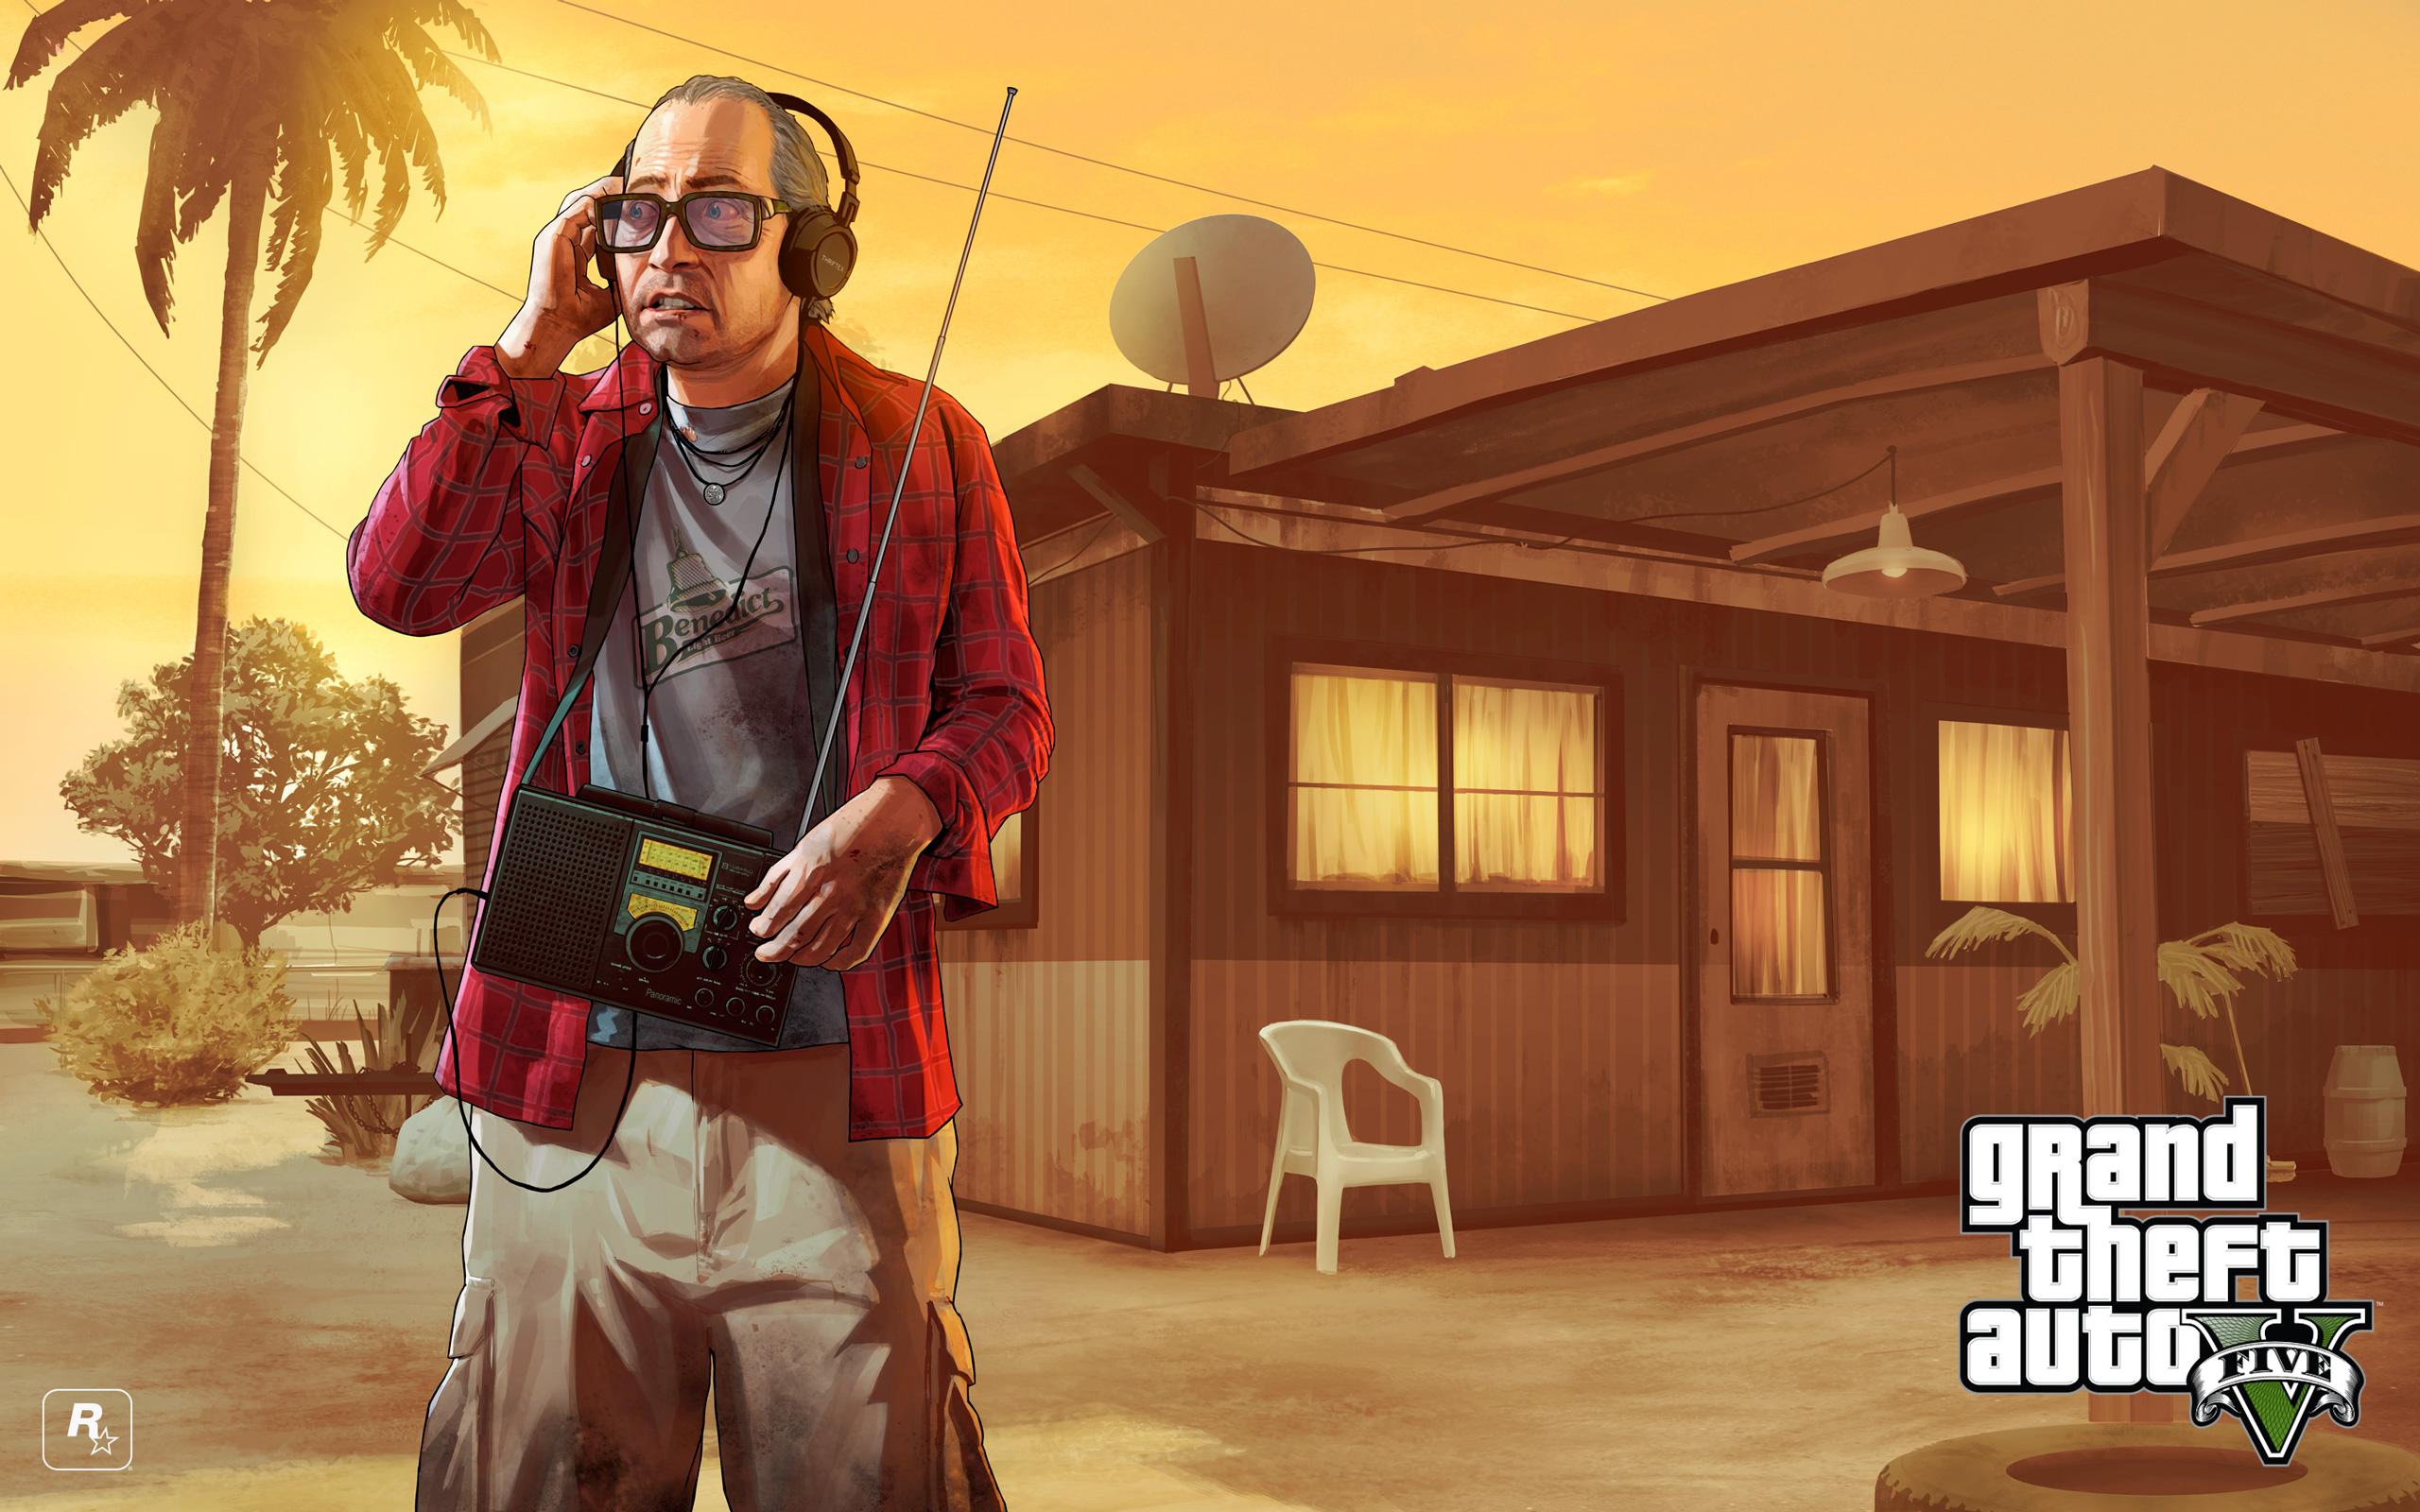 Nové obrázky z Grand Theft Auto V 85793